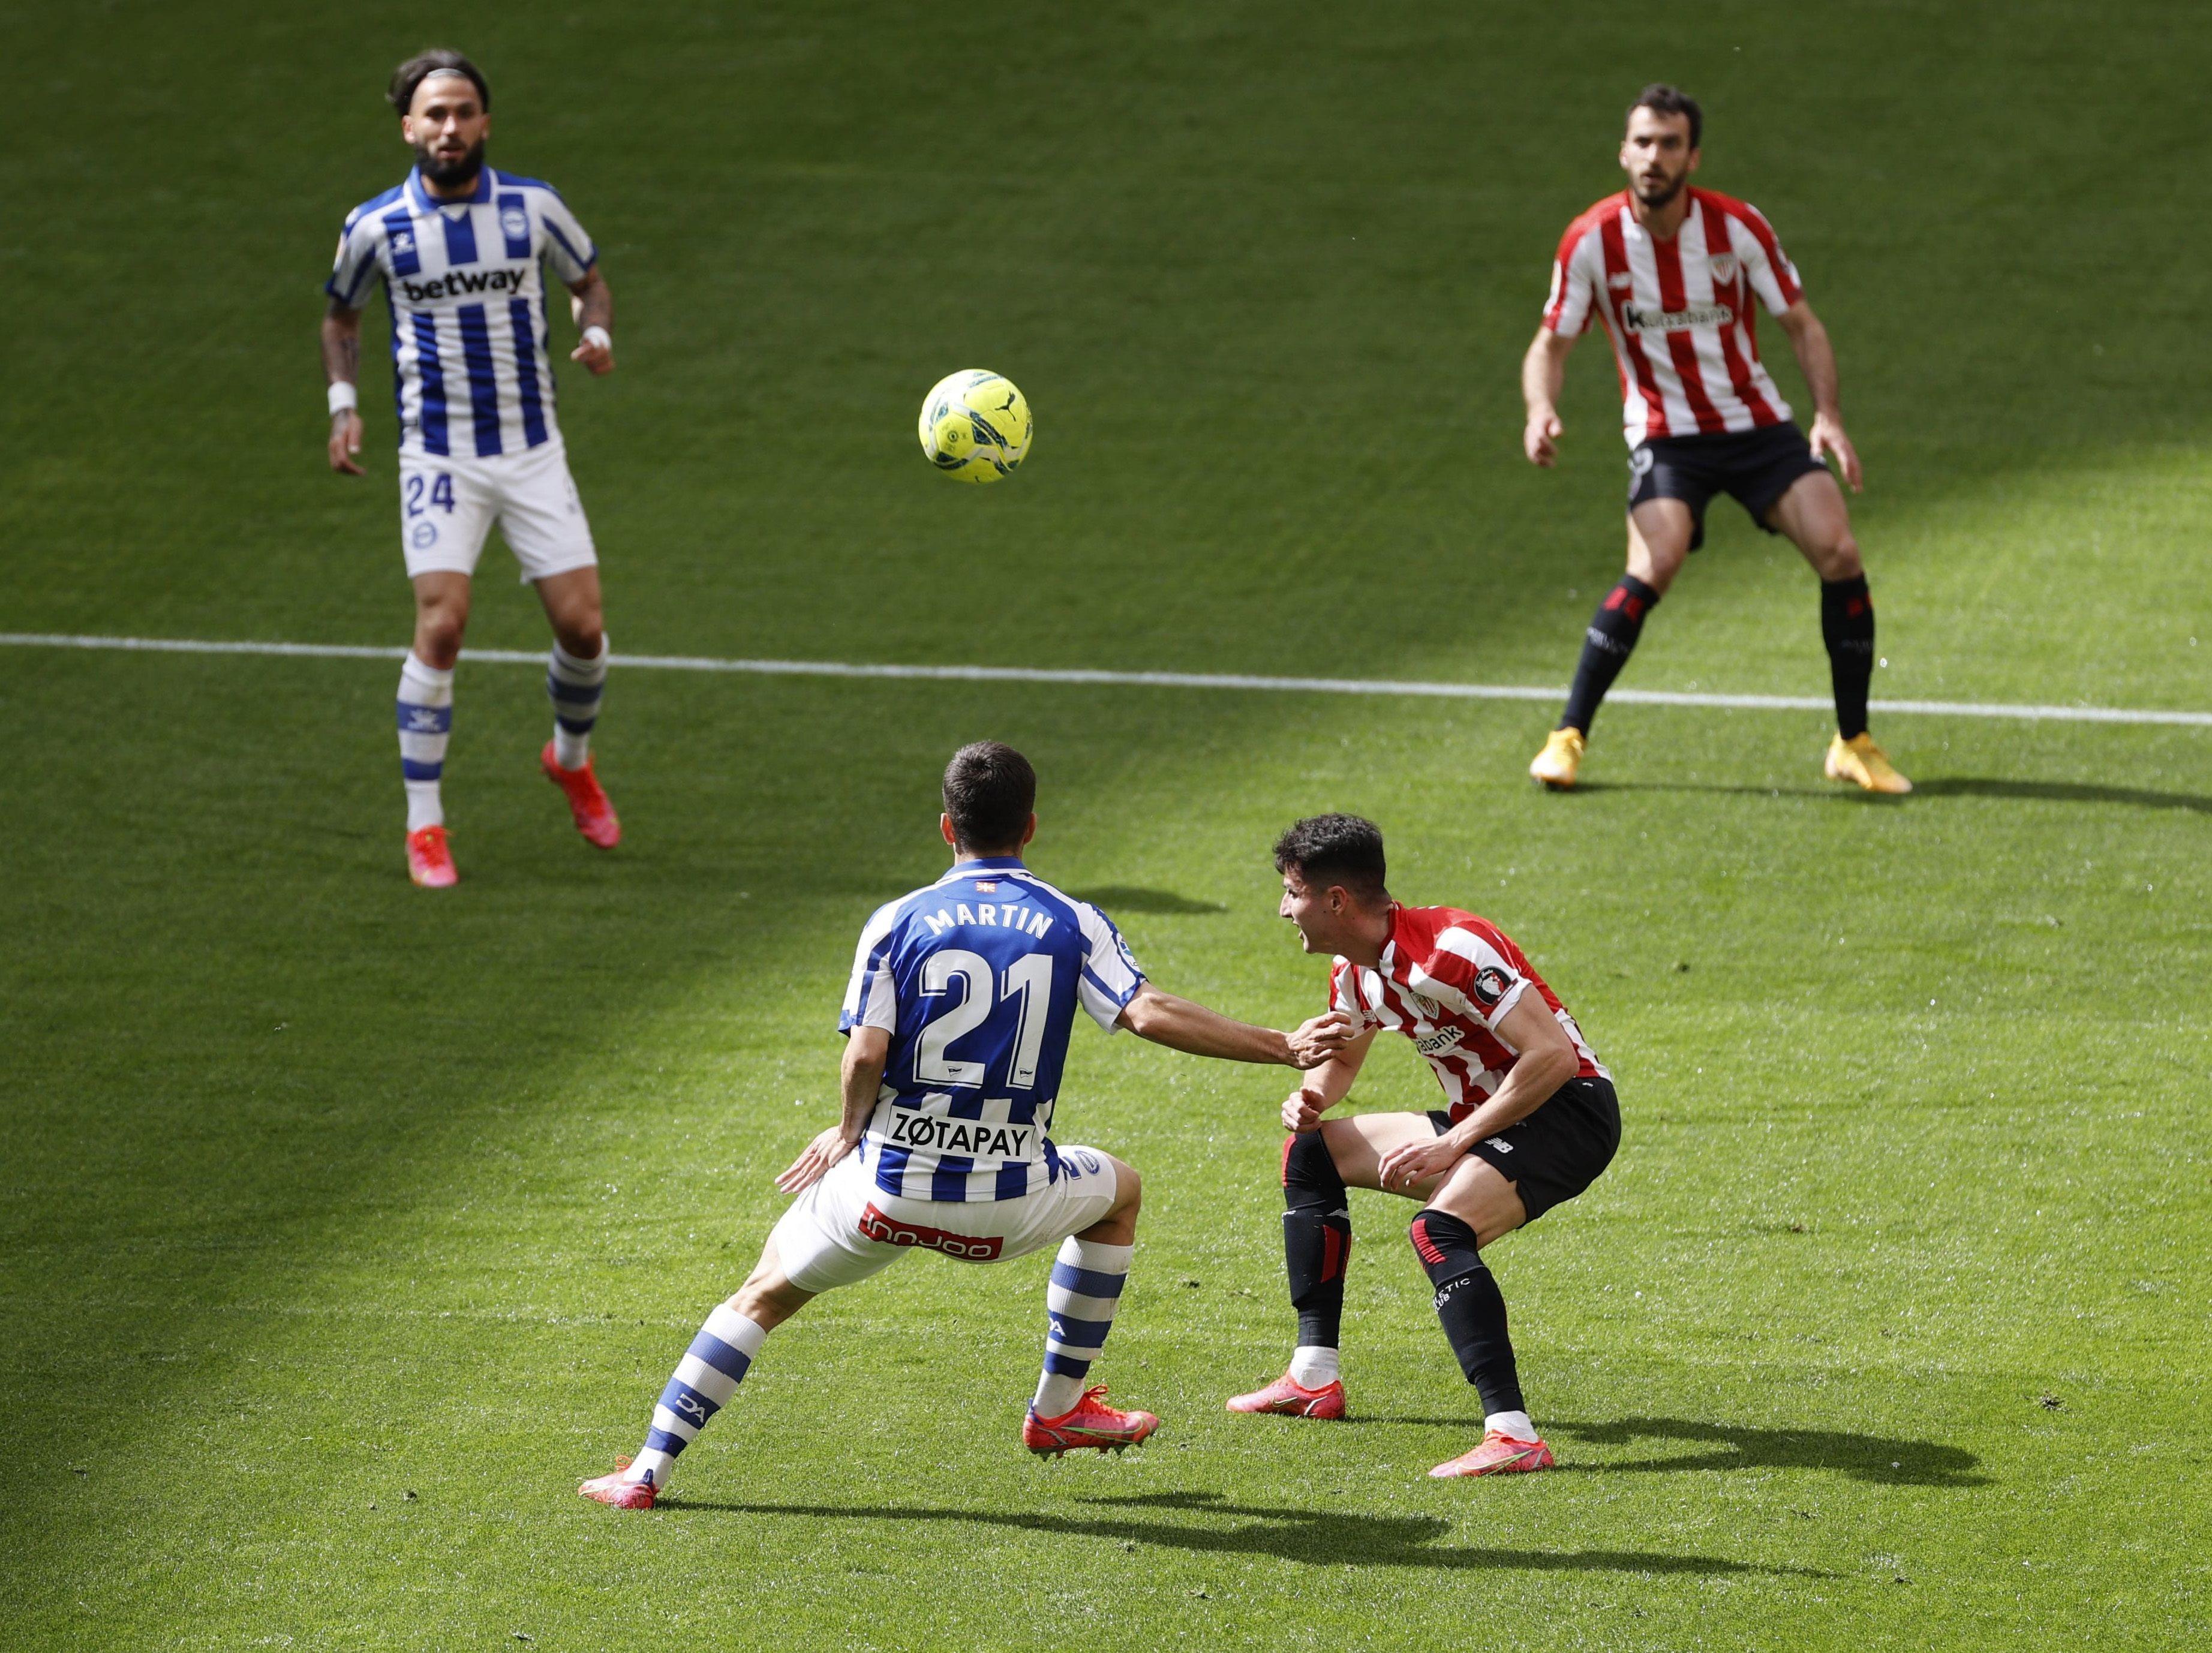 Morcillo (2d) disputa el balón a Martín Aguirregabiria (2i).